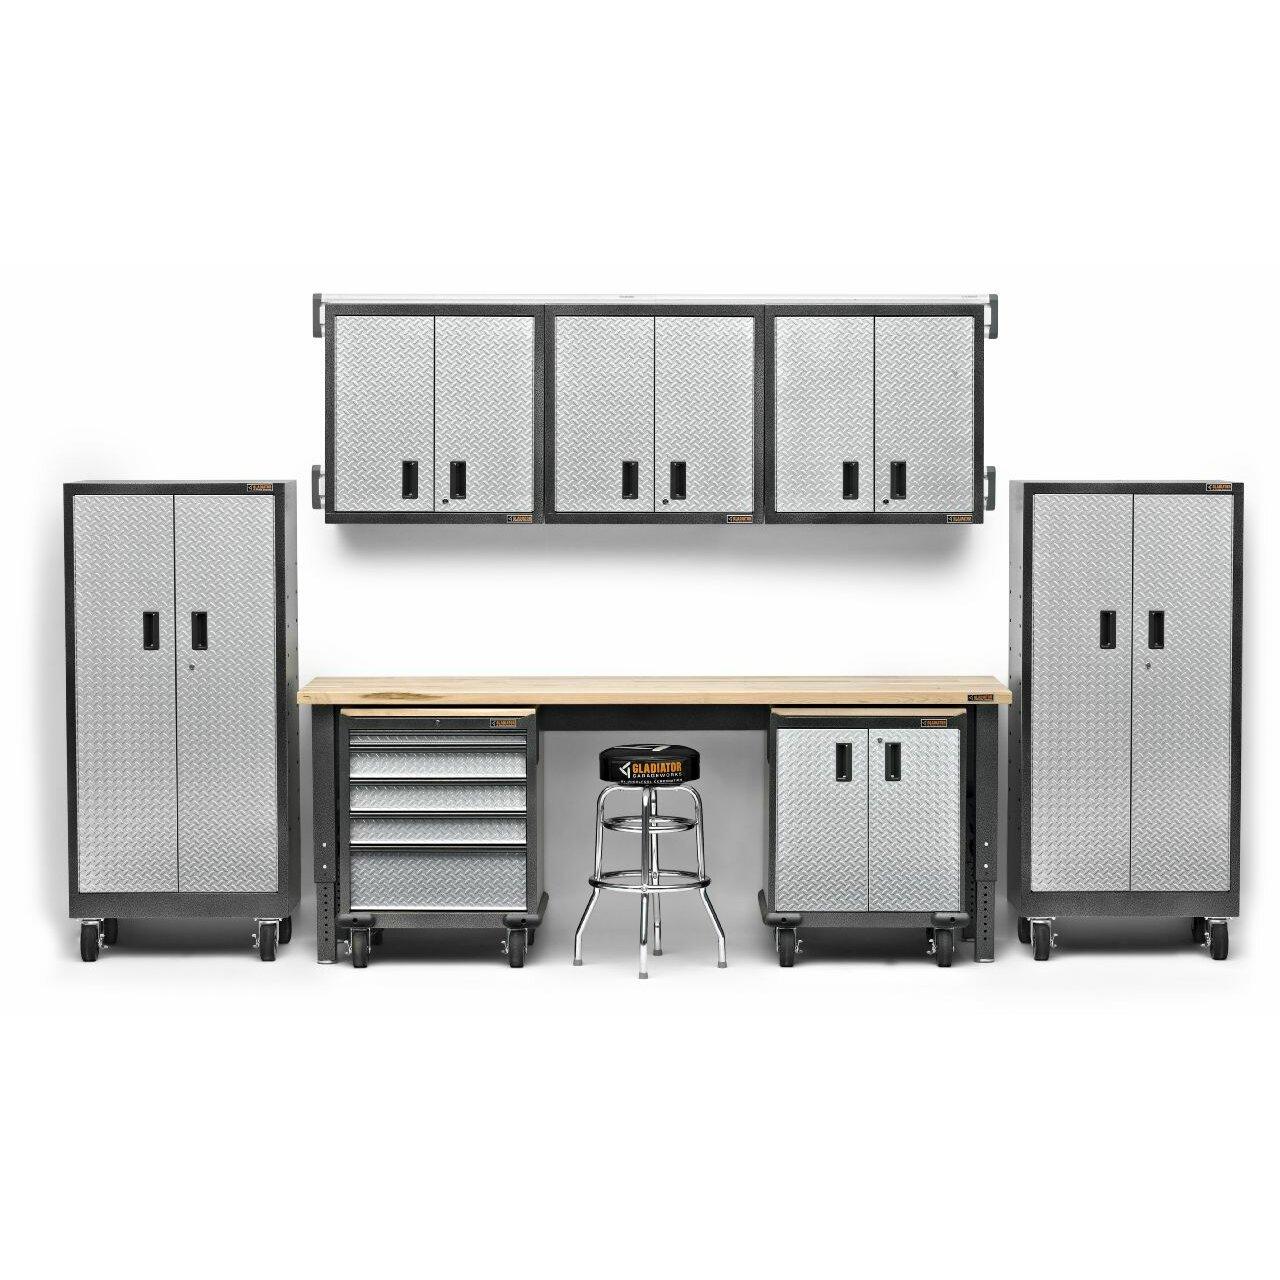 Premier Garage Cabinets #21: Gladiator 27u0026amp;quot; Maple Top For Premier Garage Cabinets